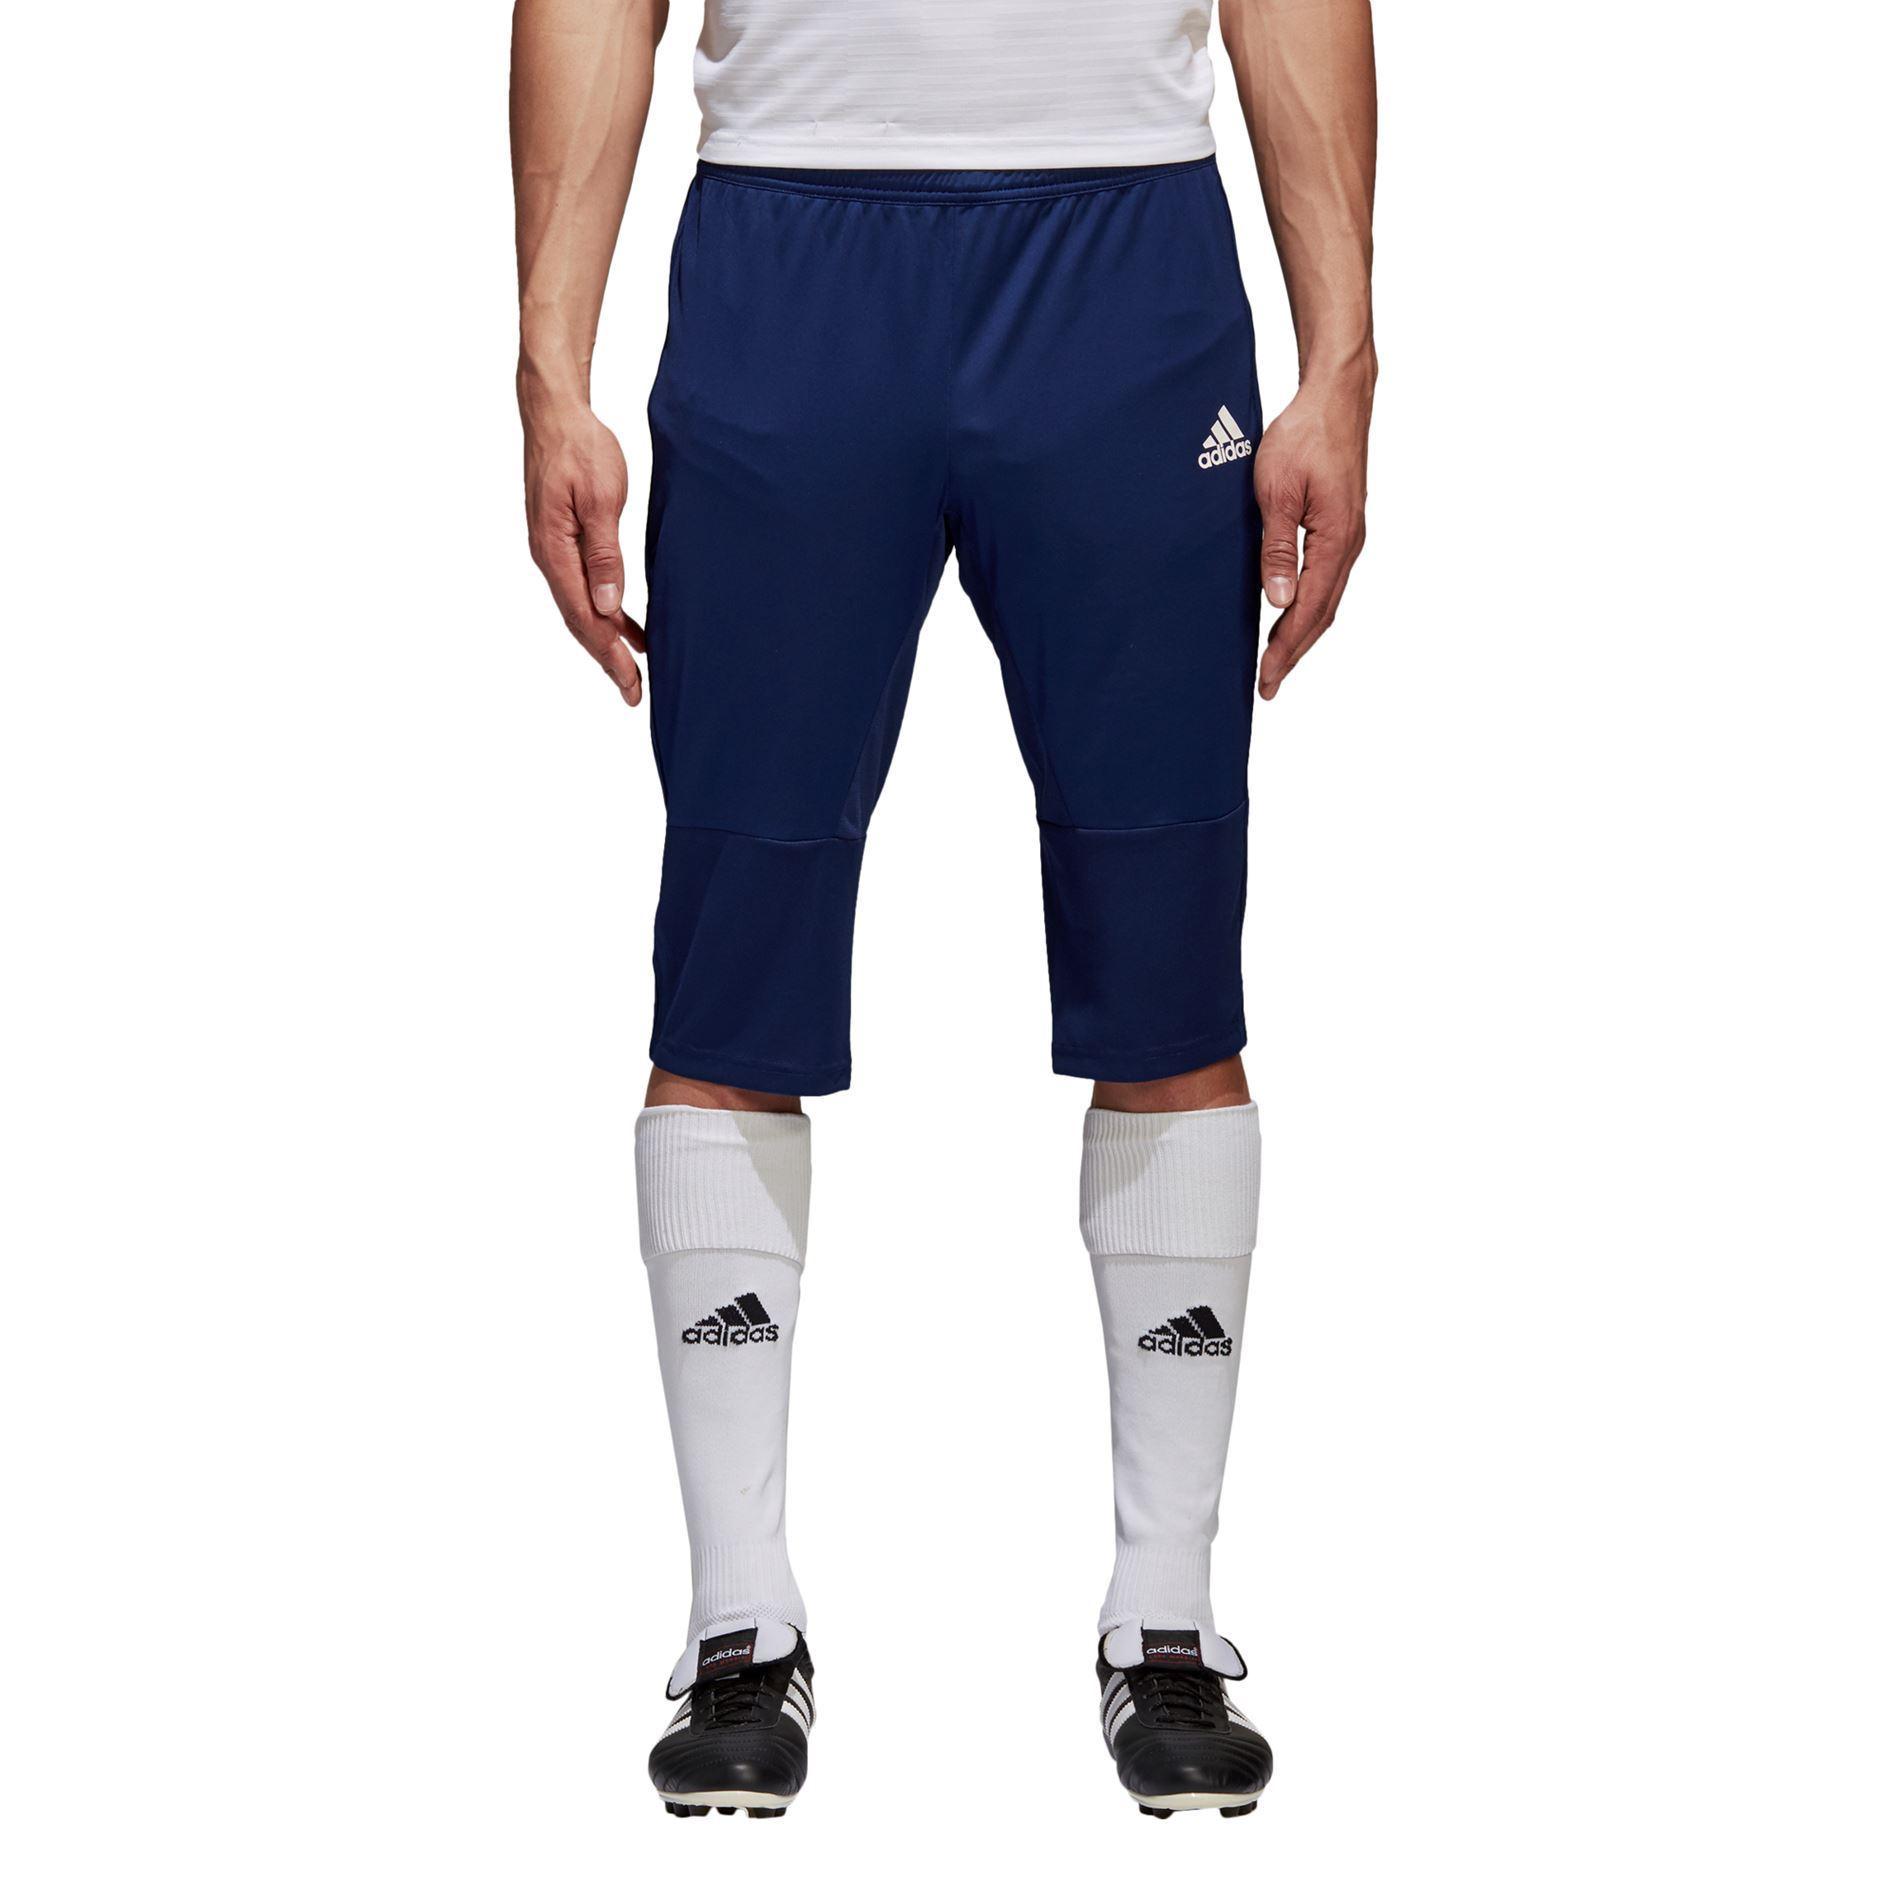 Adidas Condivo 18 34 Bukse Marine